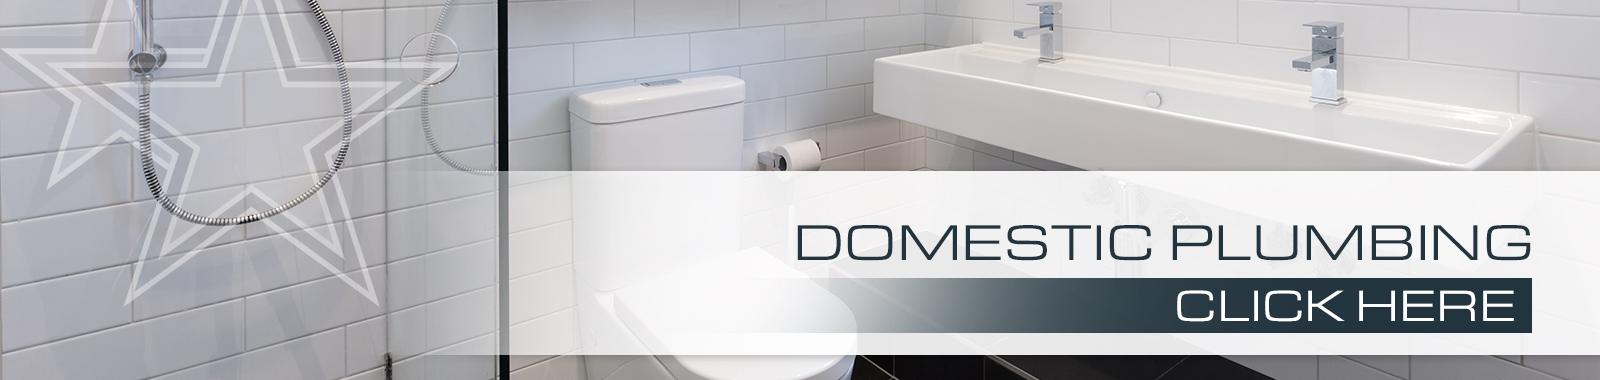 banner_domestic